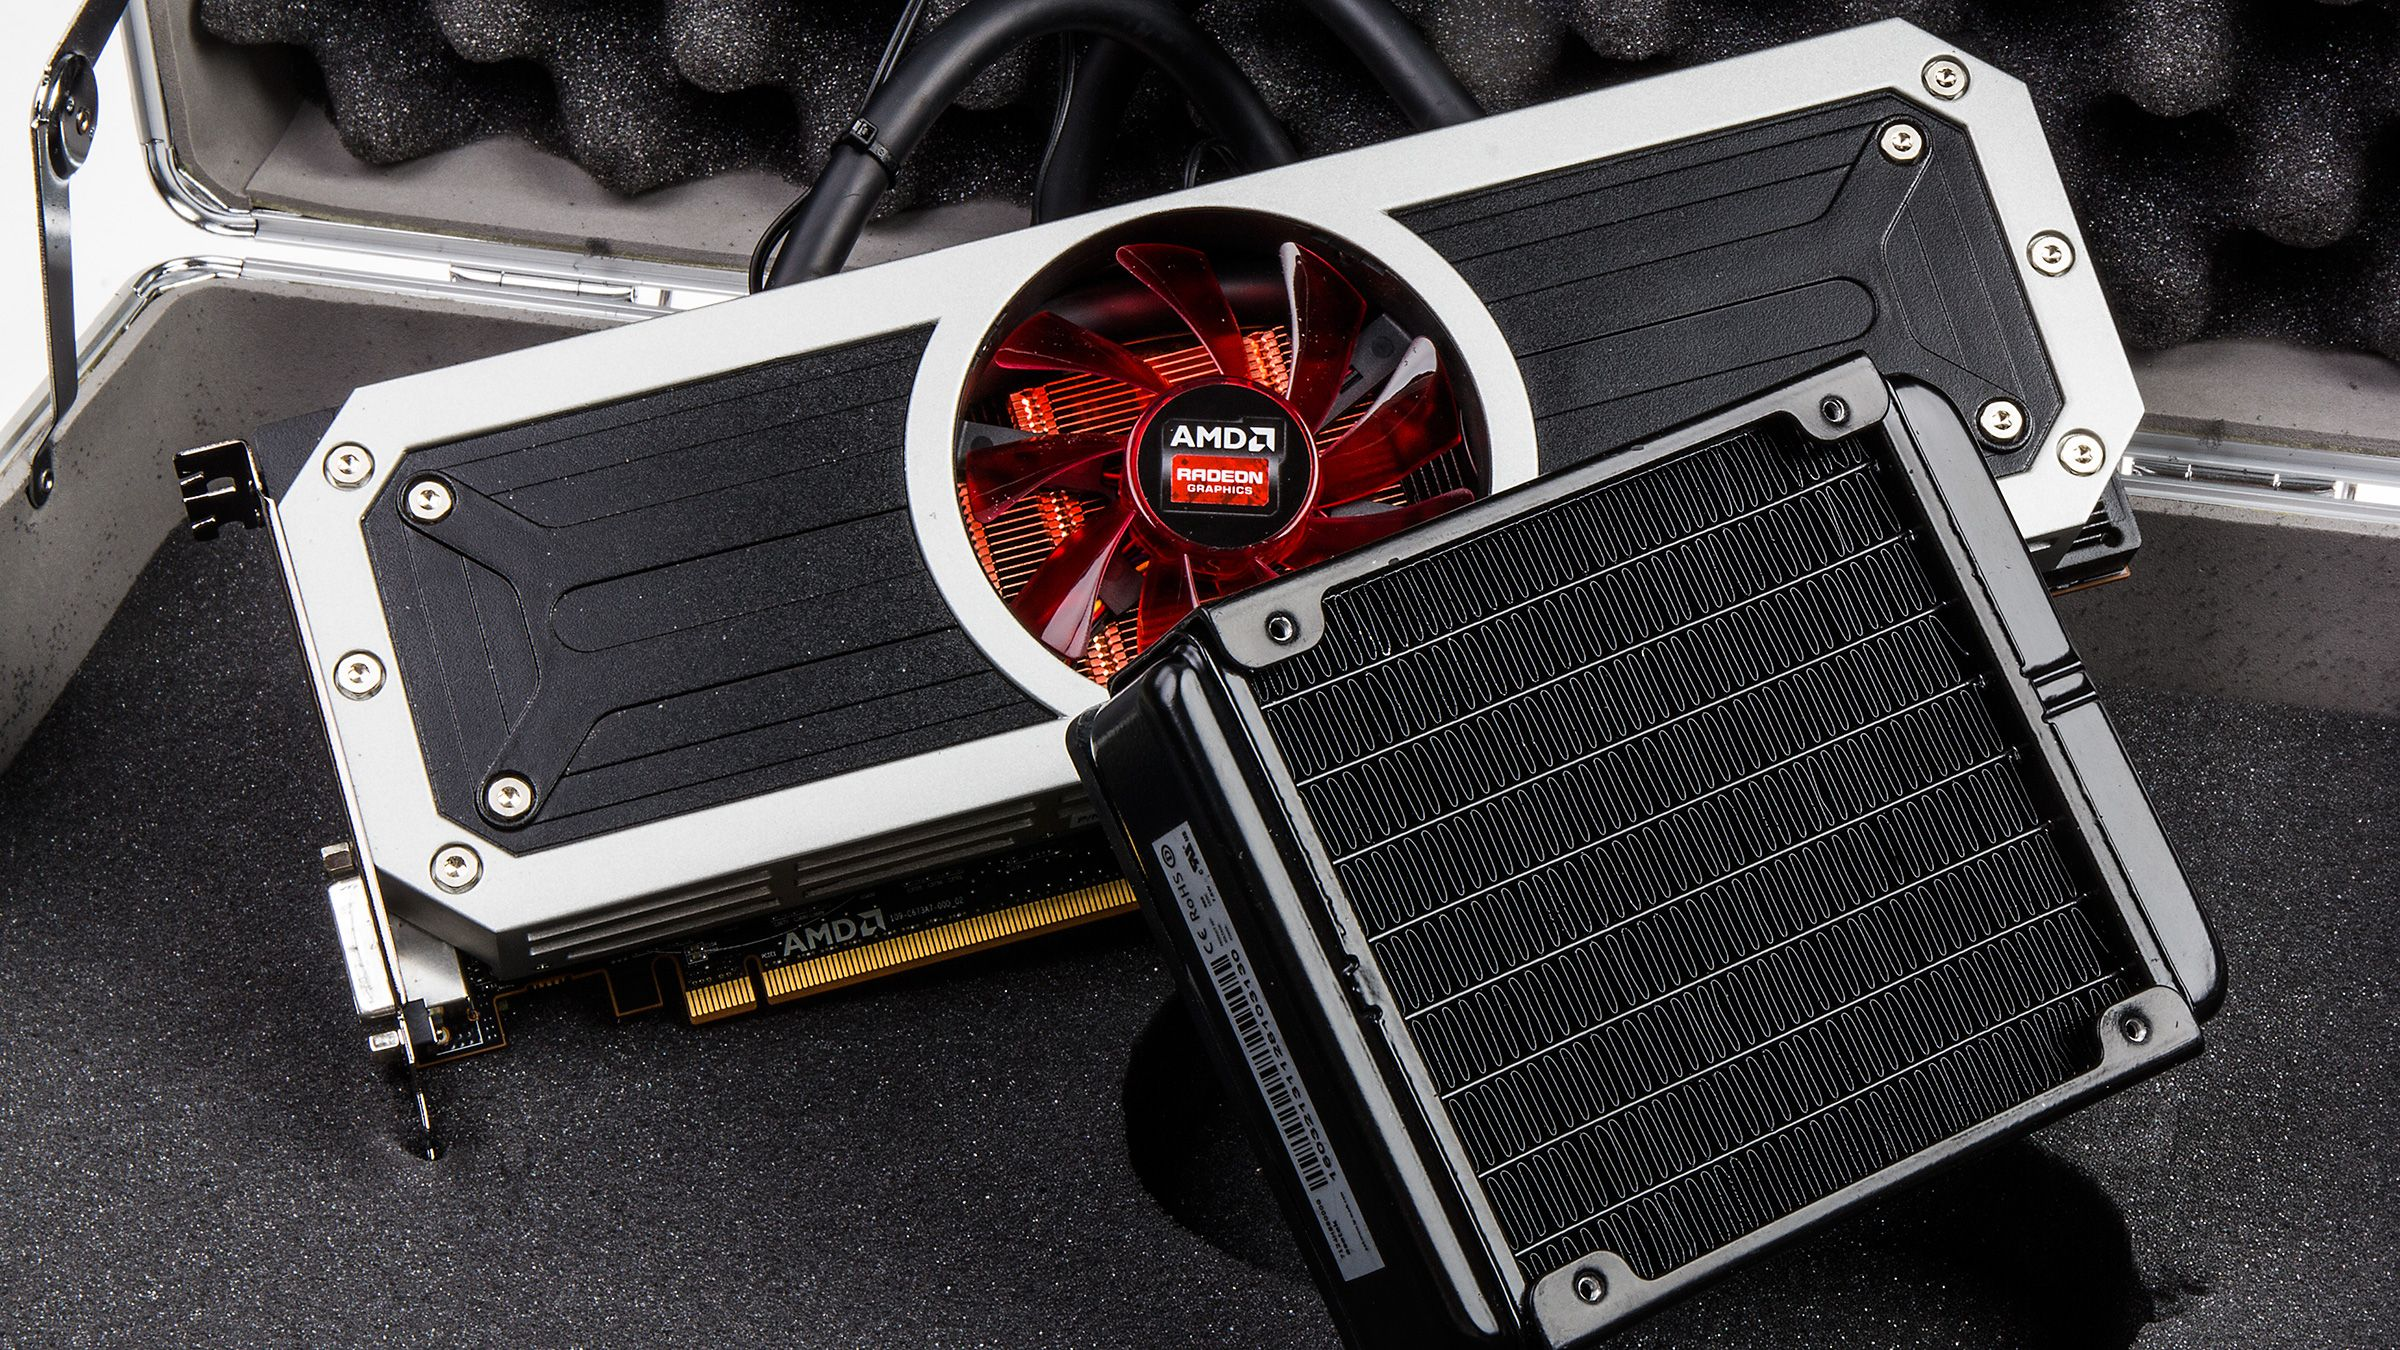 AMD Radeon R9 295X.Foto: Varg Aamo, Hardware.no